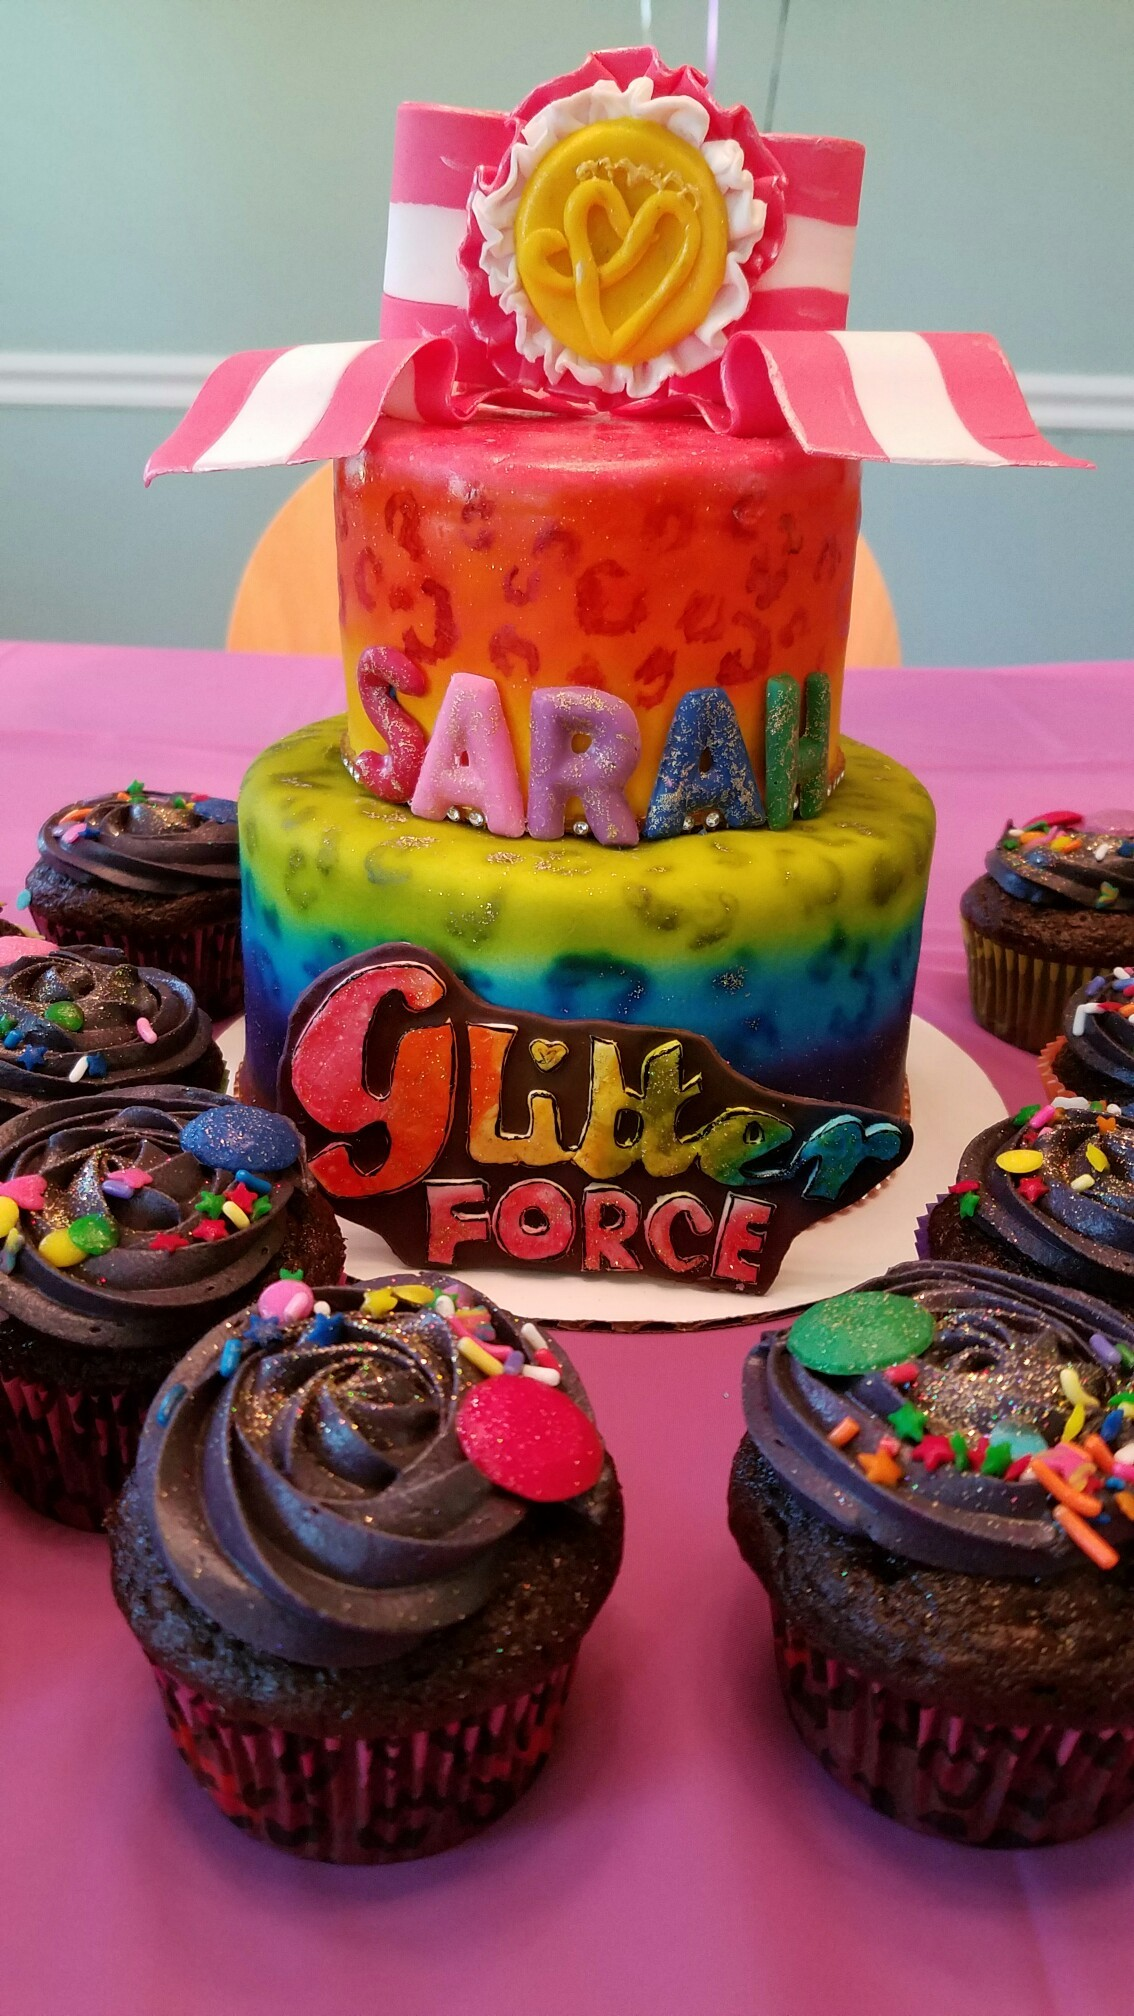 Glitter force cake